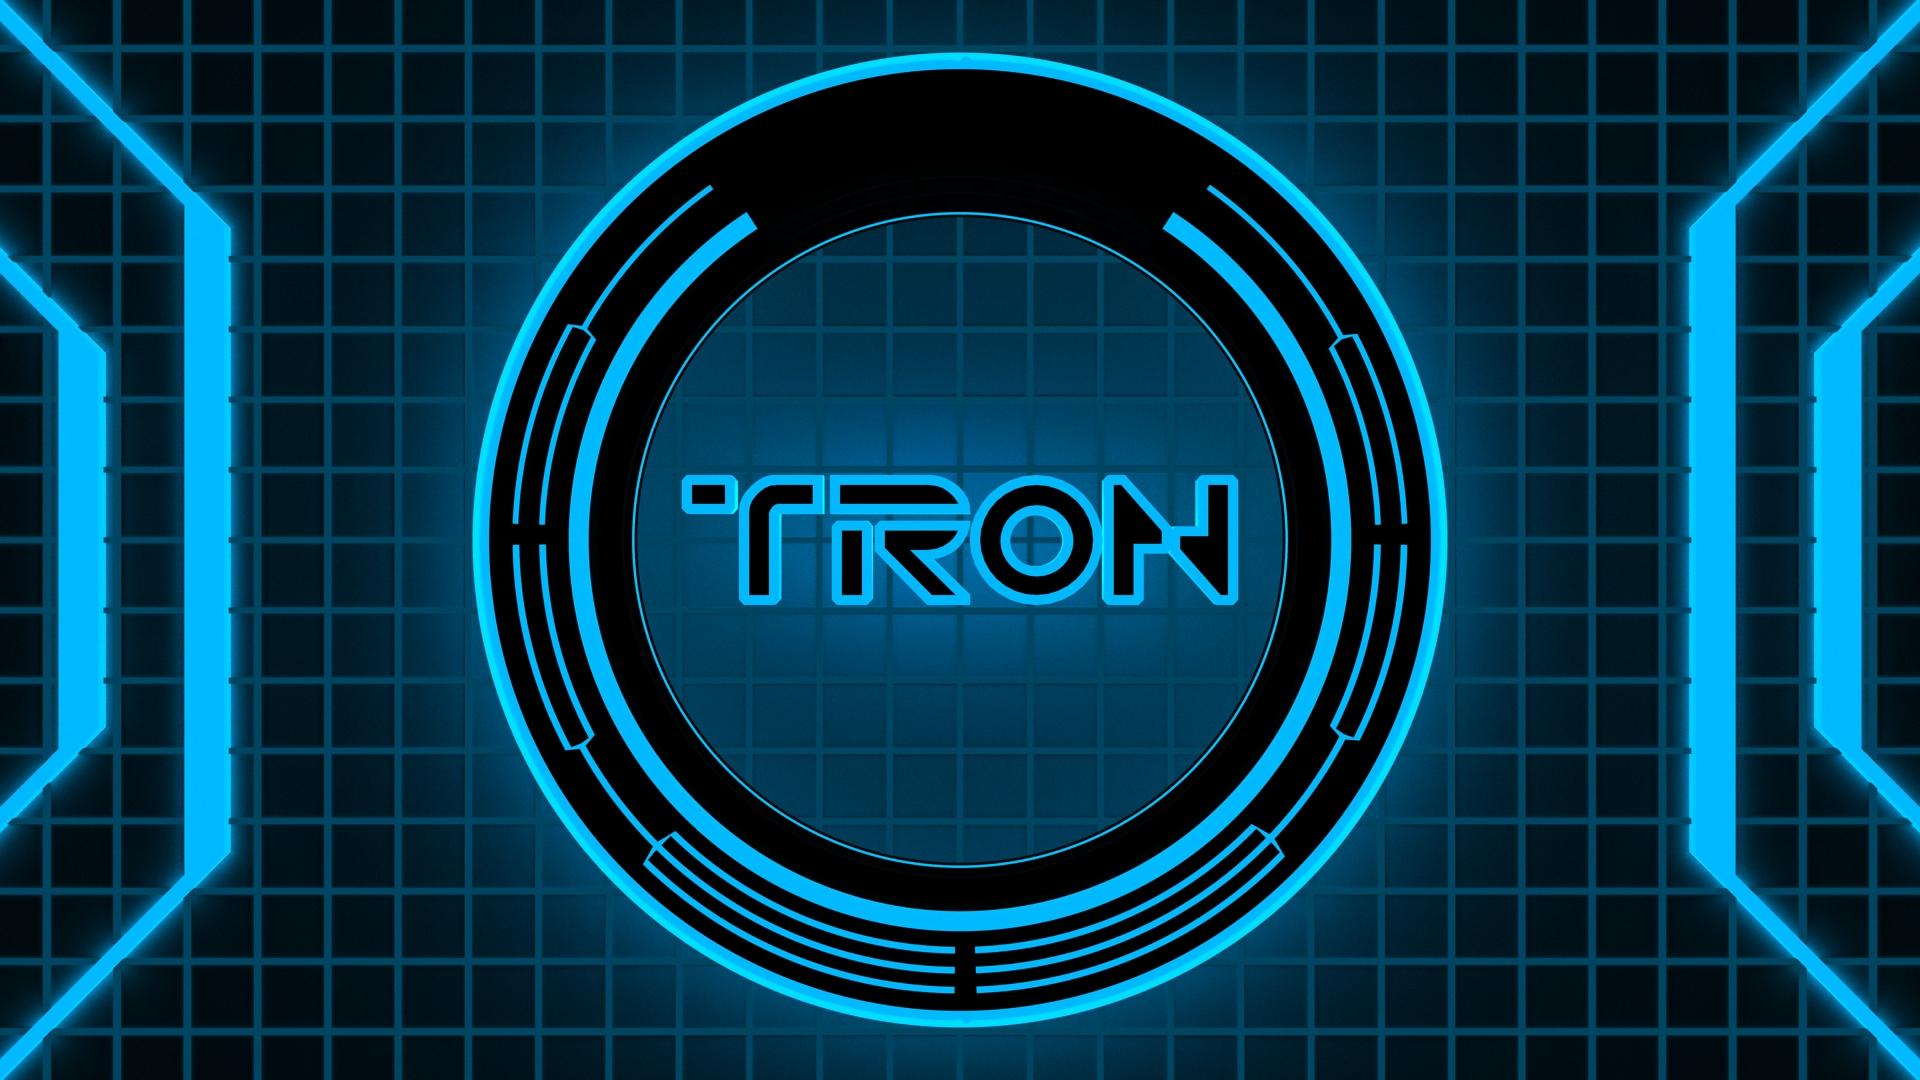 Tron Wallpaper - Blue by MacsForever on DeviantArt